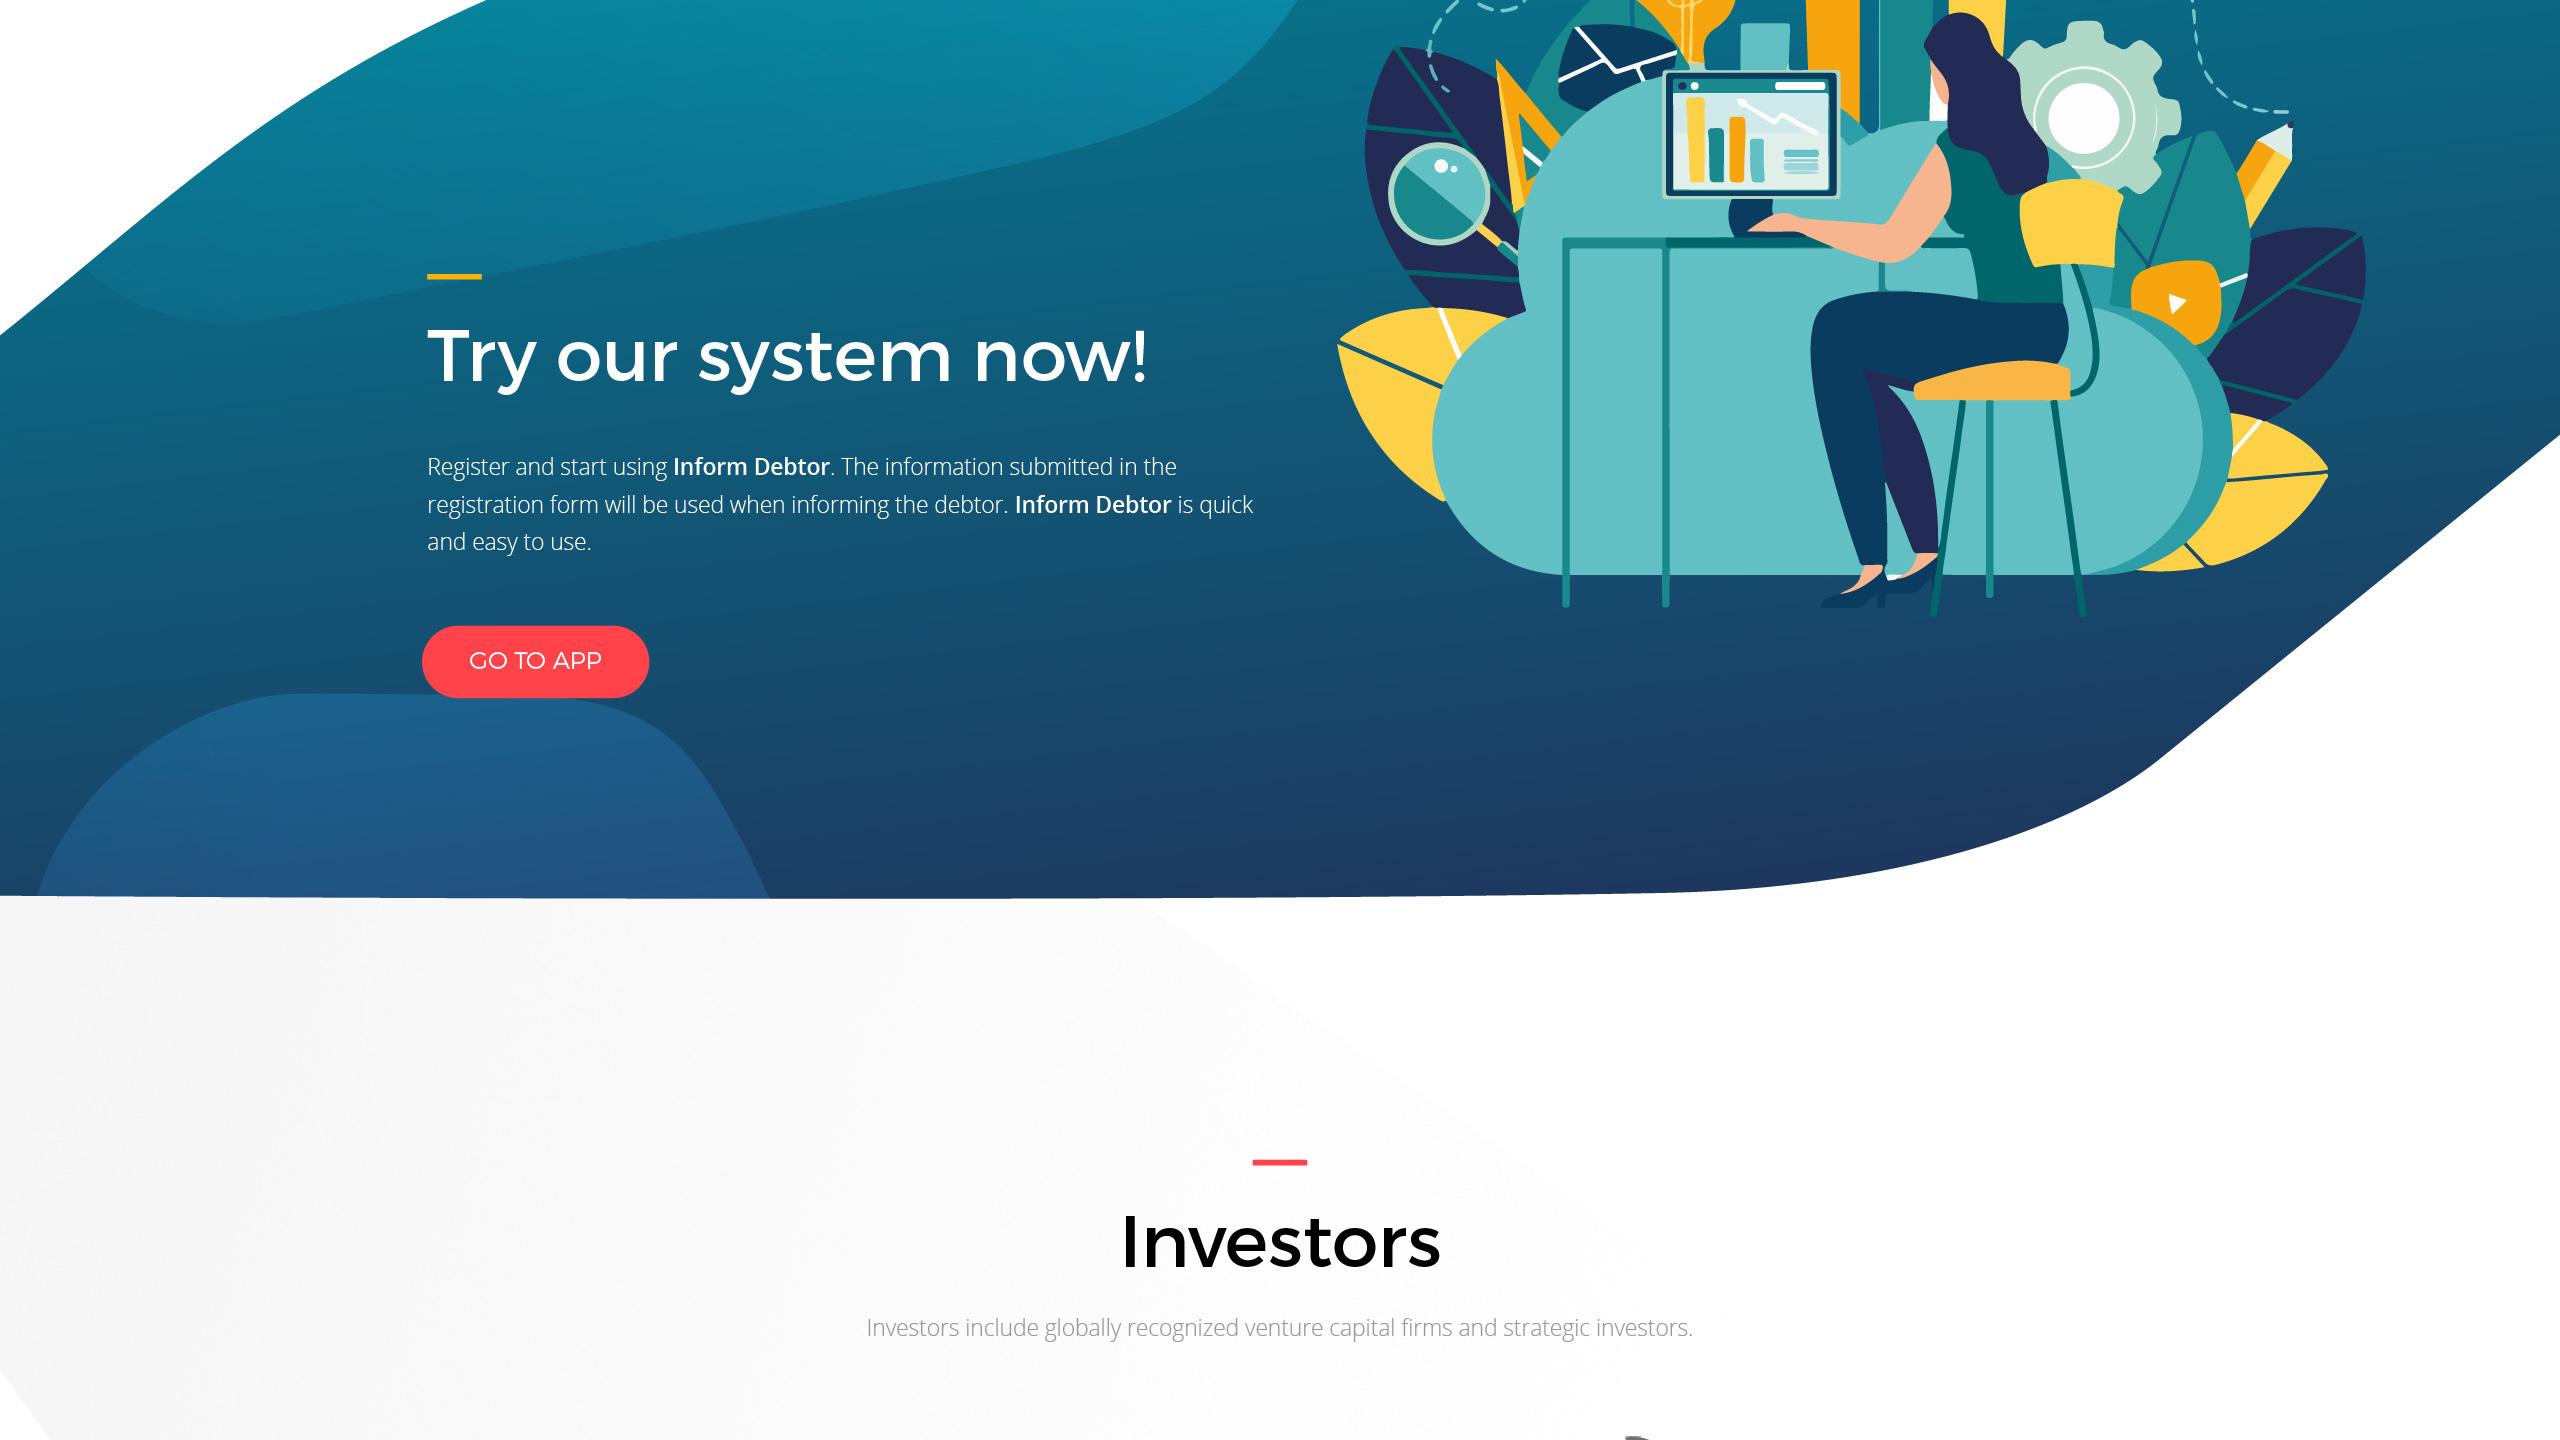 Inform Debtor 06/ Logobou design